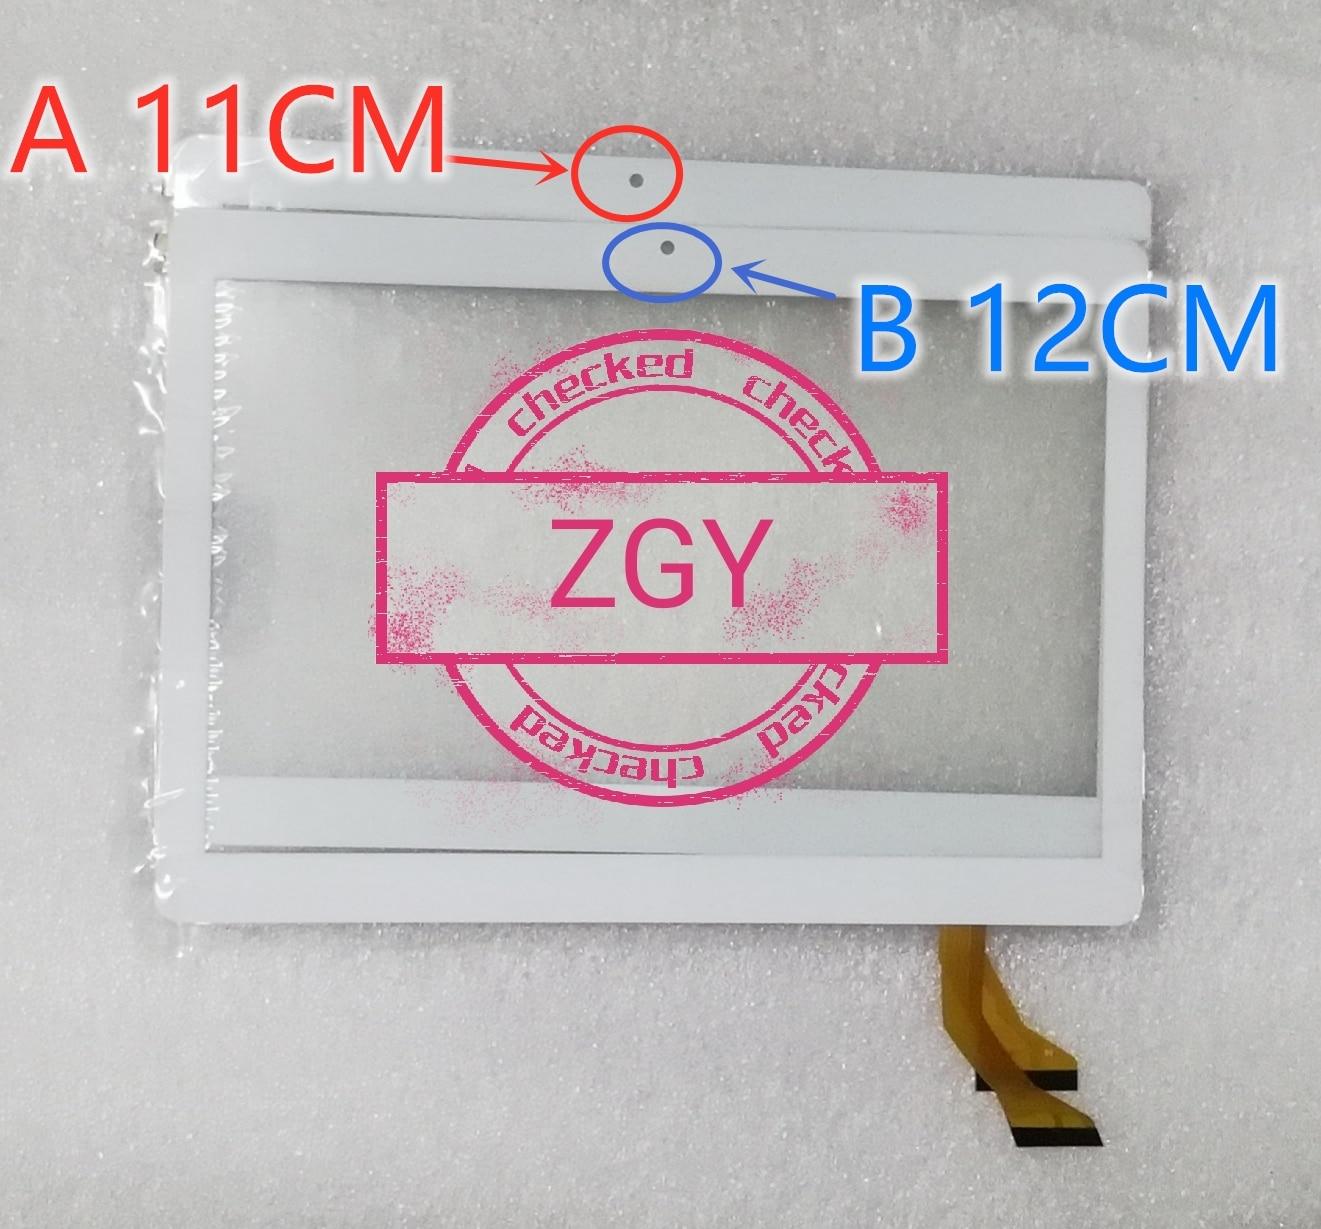 ZGY ceo-1001-jty для 10,1 дюймового планшета CARBAYTA K99 CARBAYTA s109, сенсорный экран, дигитайзер, панель, стеклянный датчик